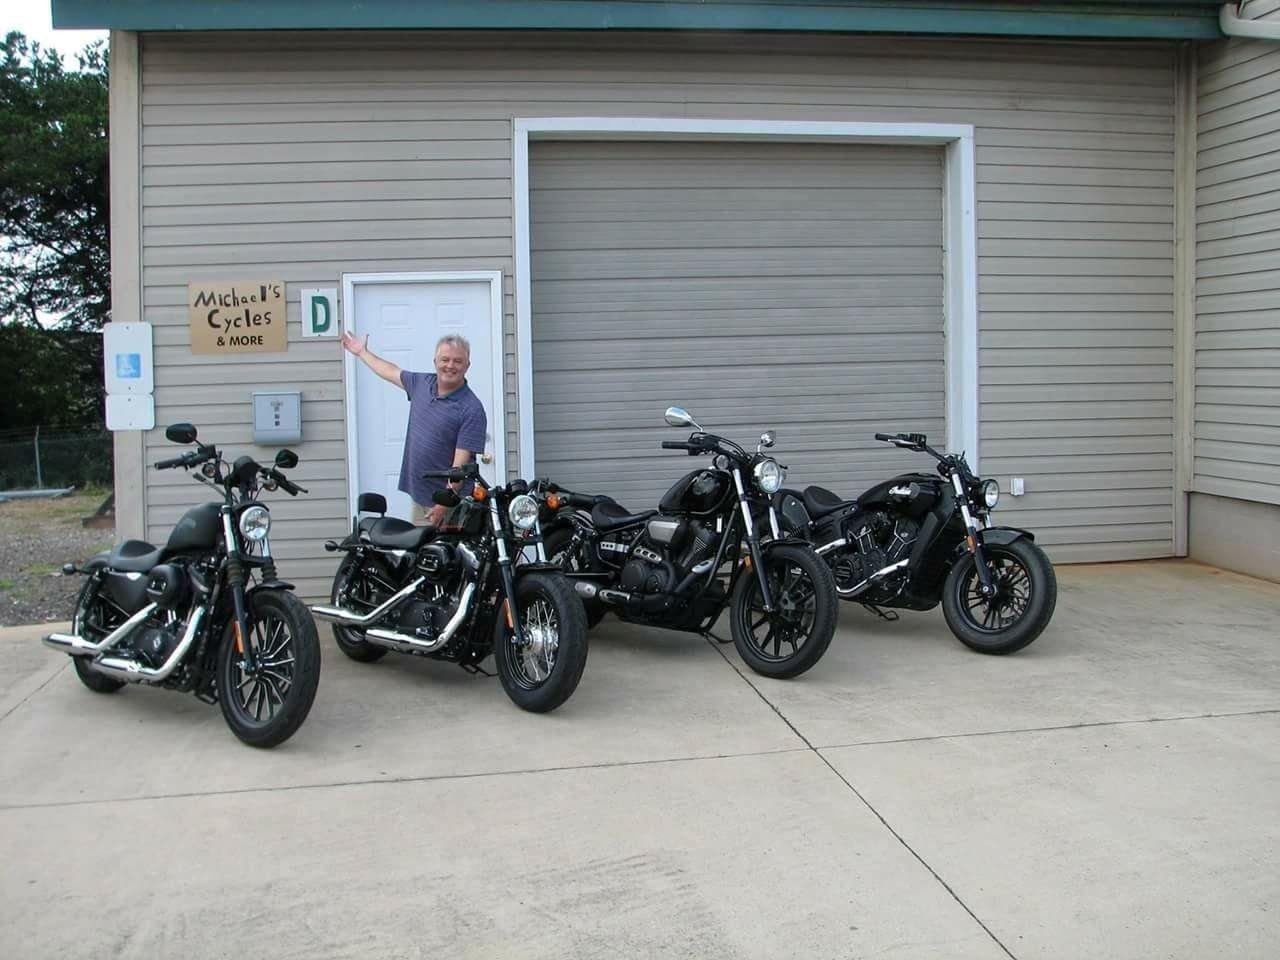 Michael's Cycles & More LLC